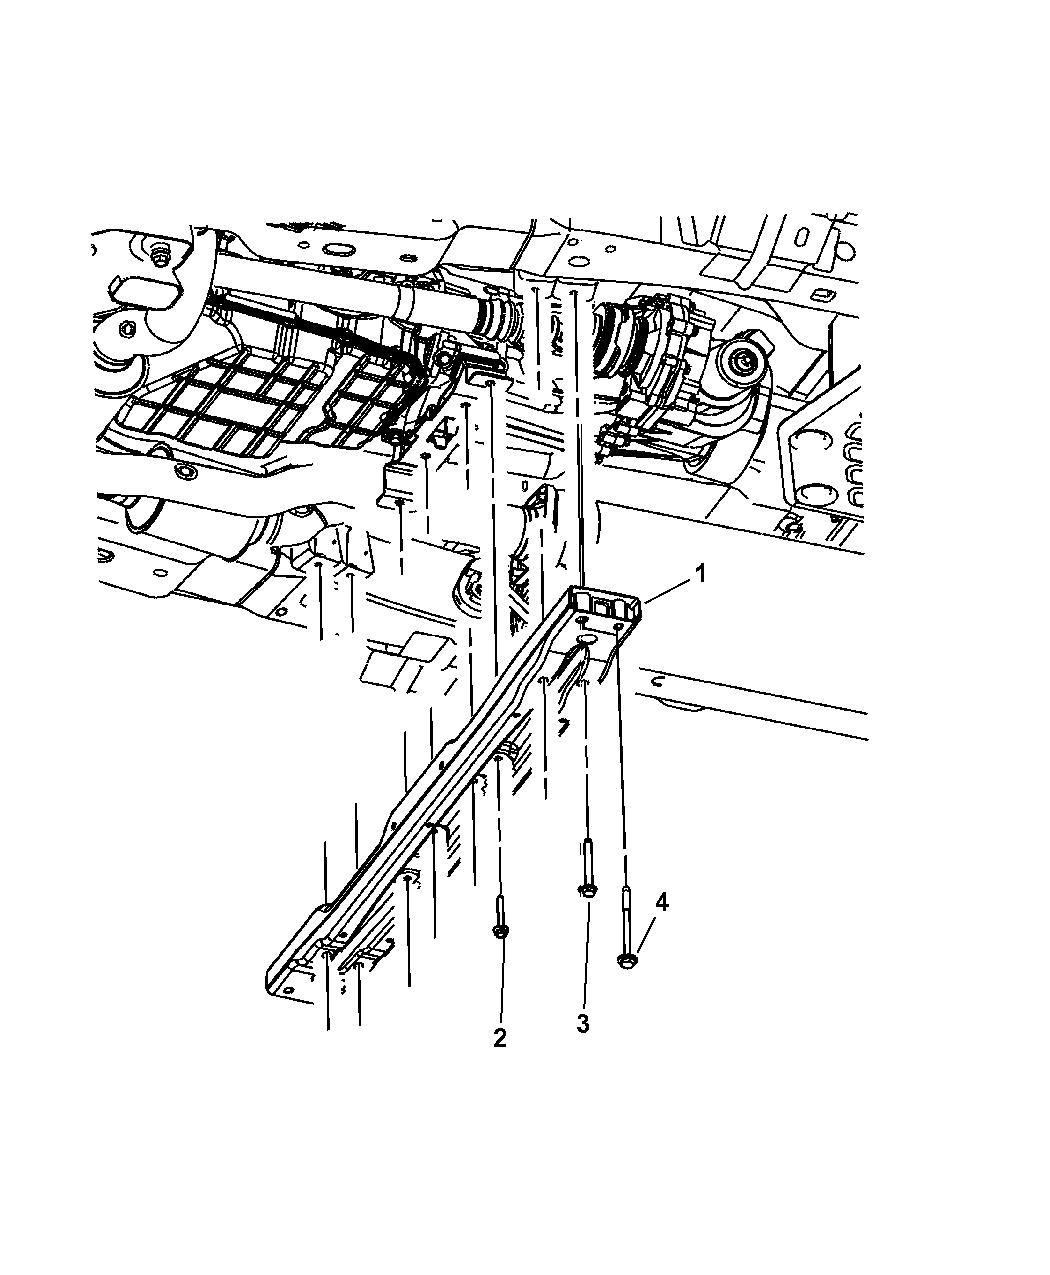 File: Profile Ge Jp960bkbb Wiring Diagram